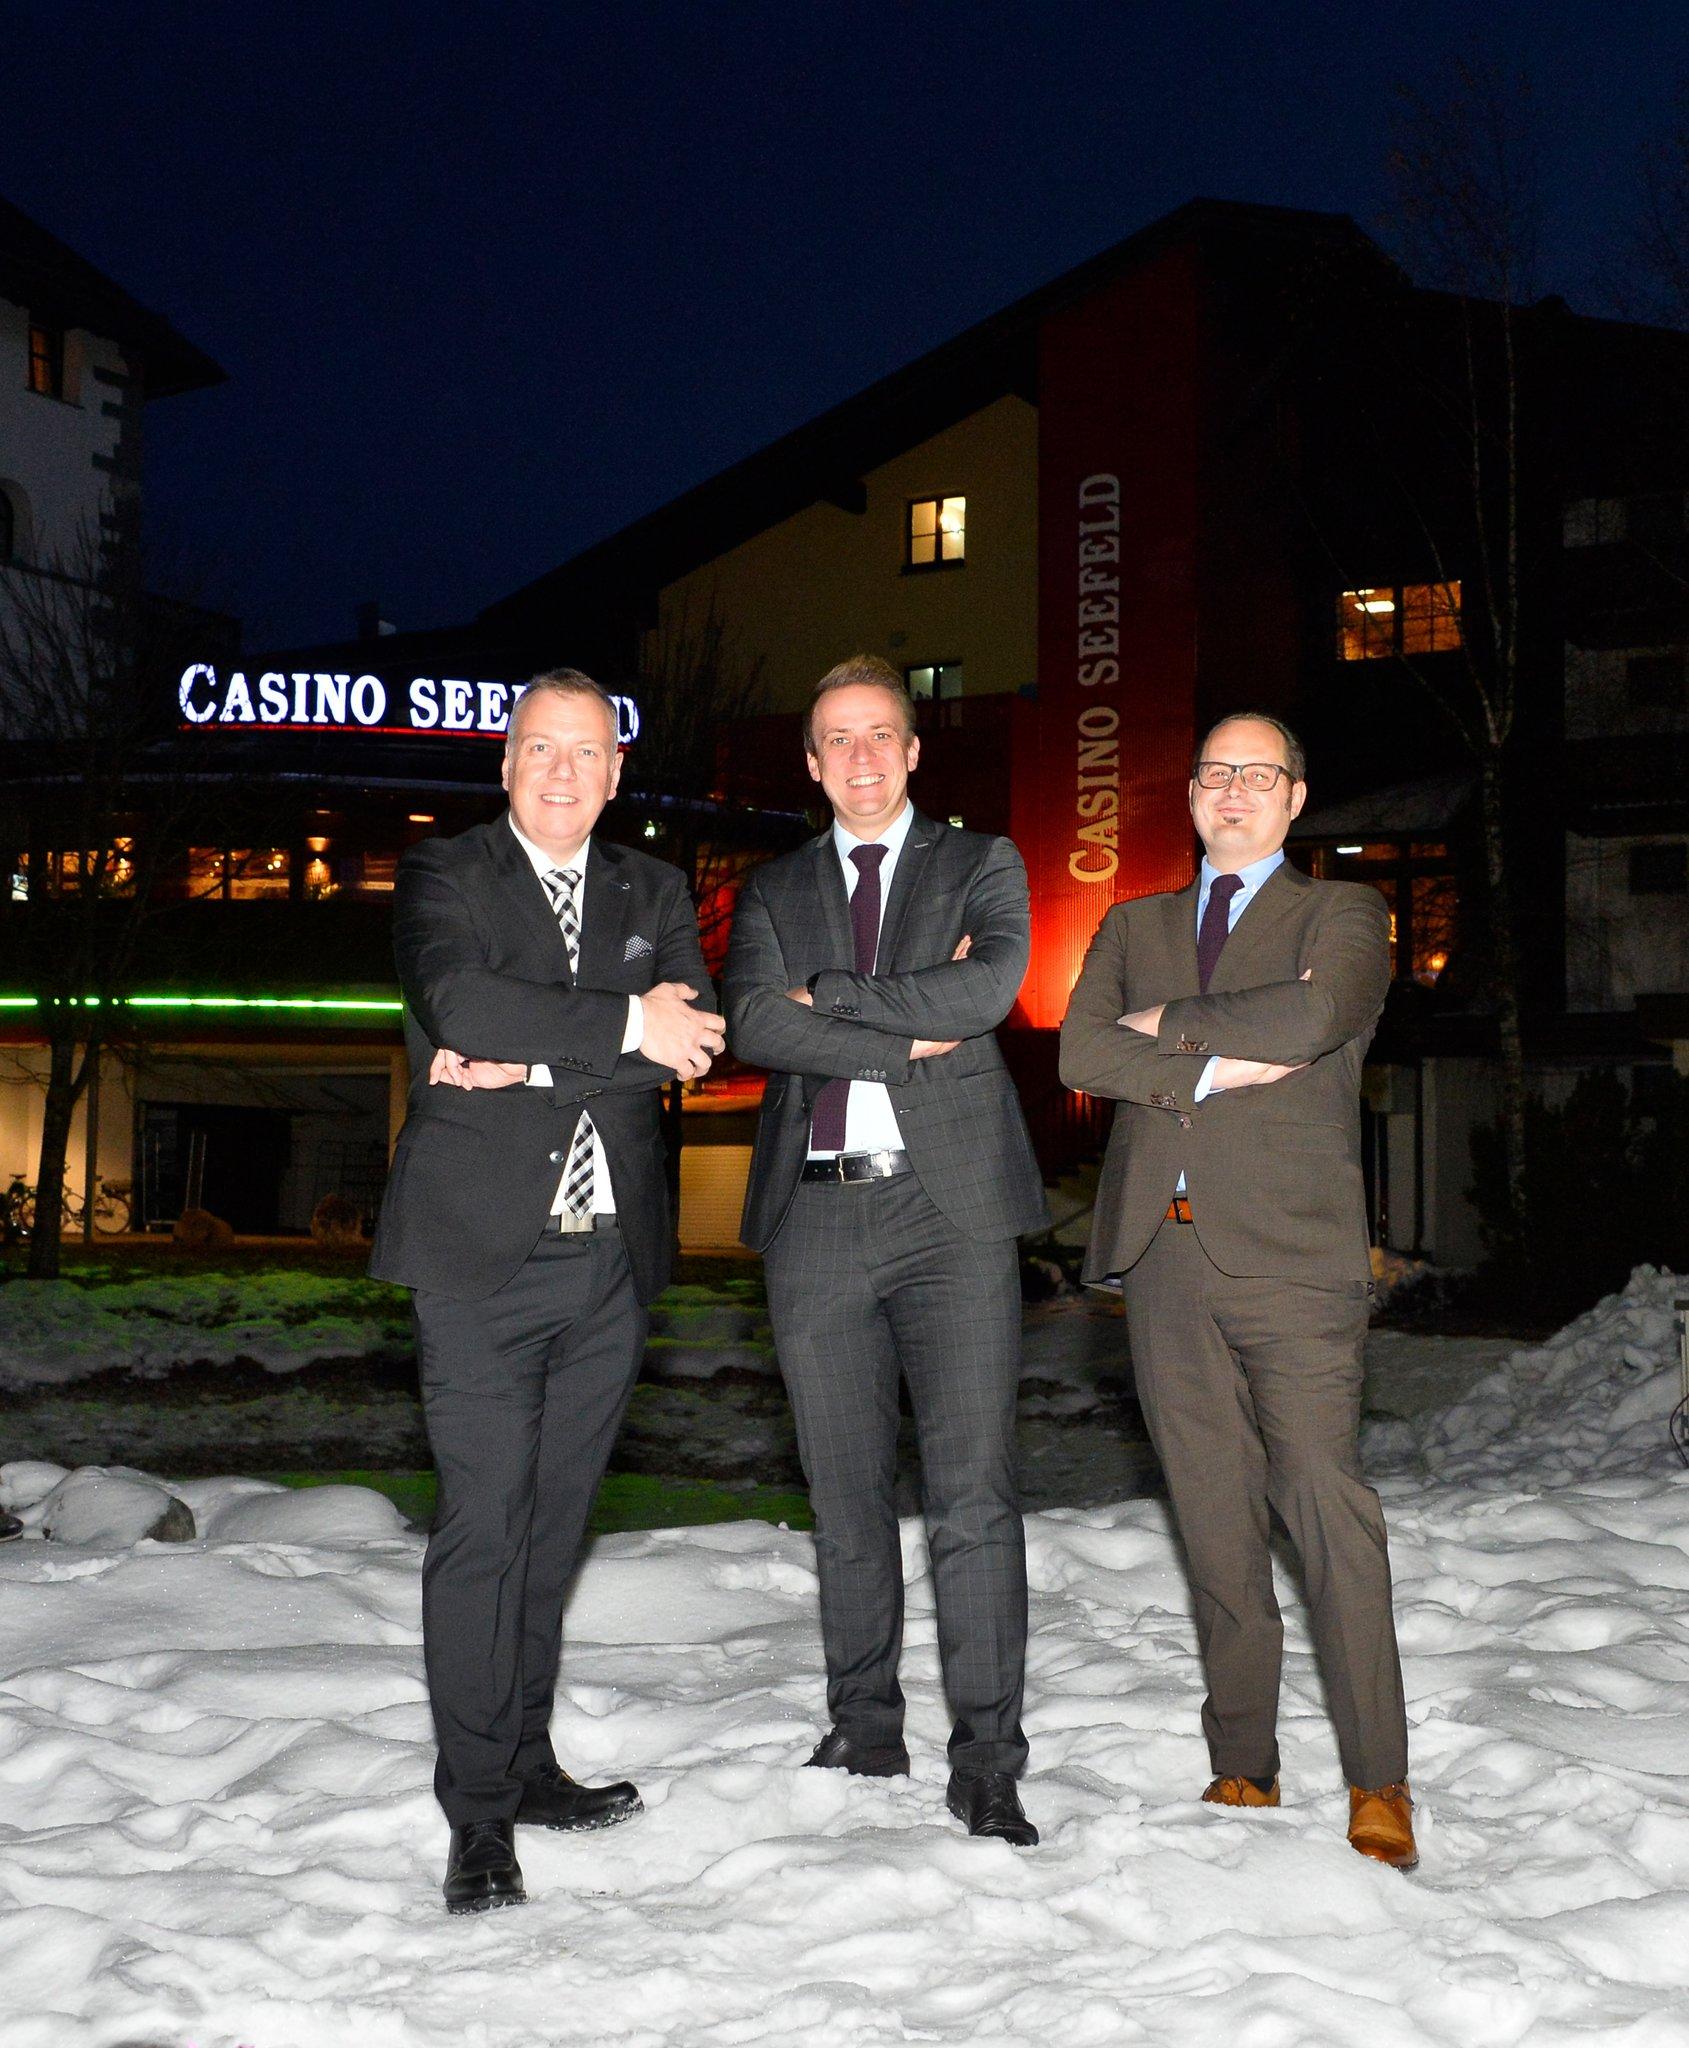 Casino Seefeld Erfahrung